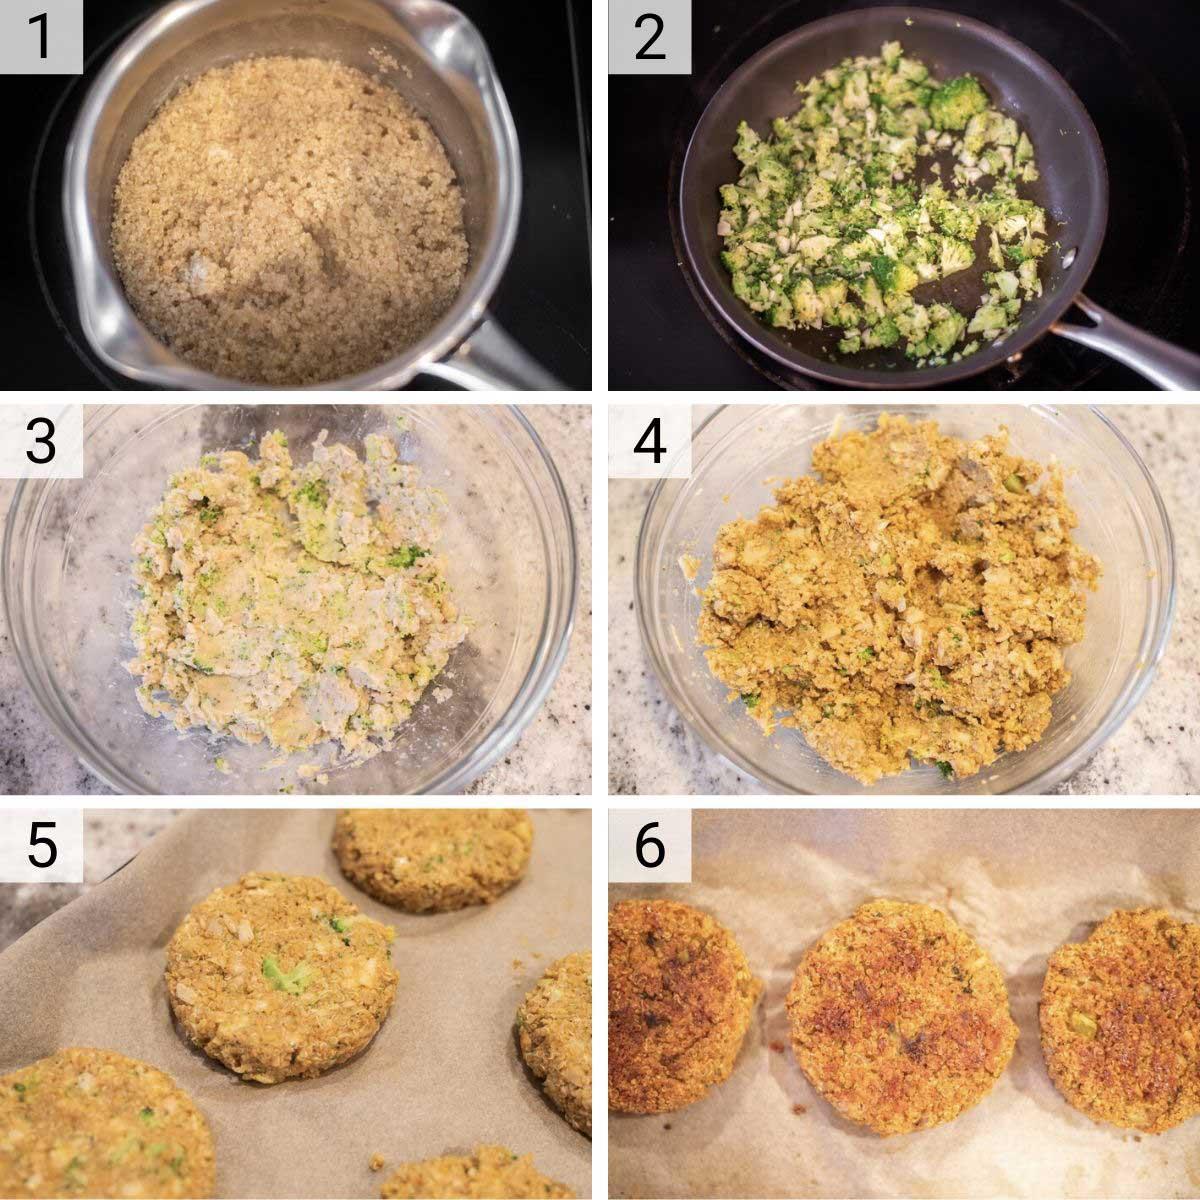 process shots of how to make quinoa burgers